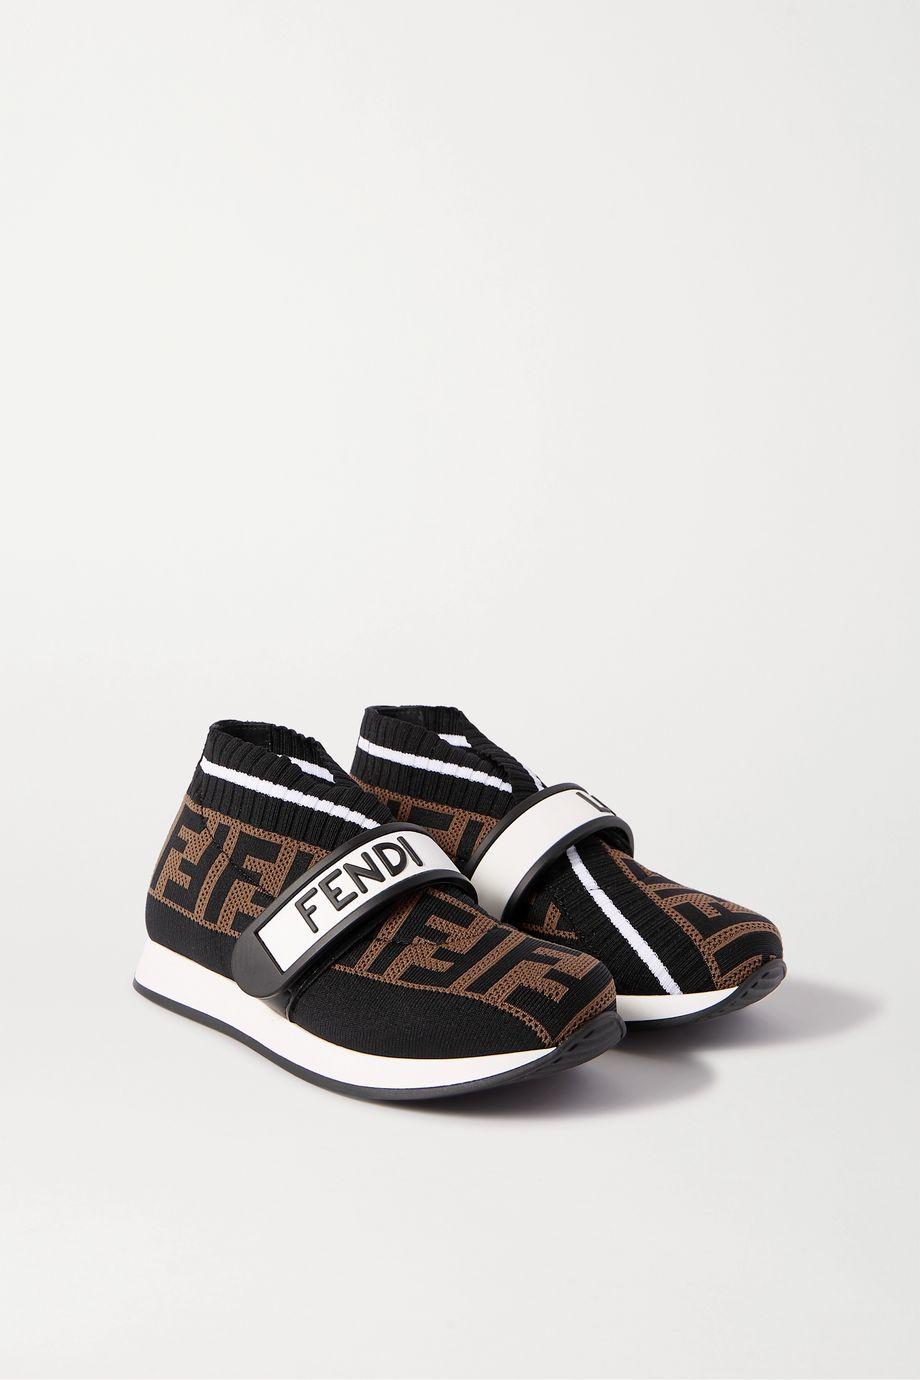 Fendi Kids Sizes 24-31 logo-print mesh and neoprene sneakers